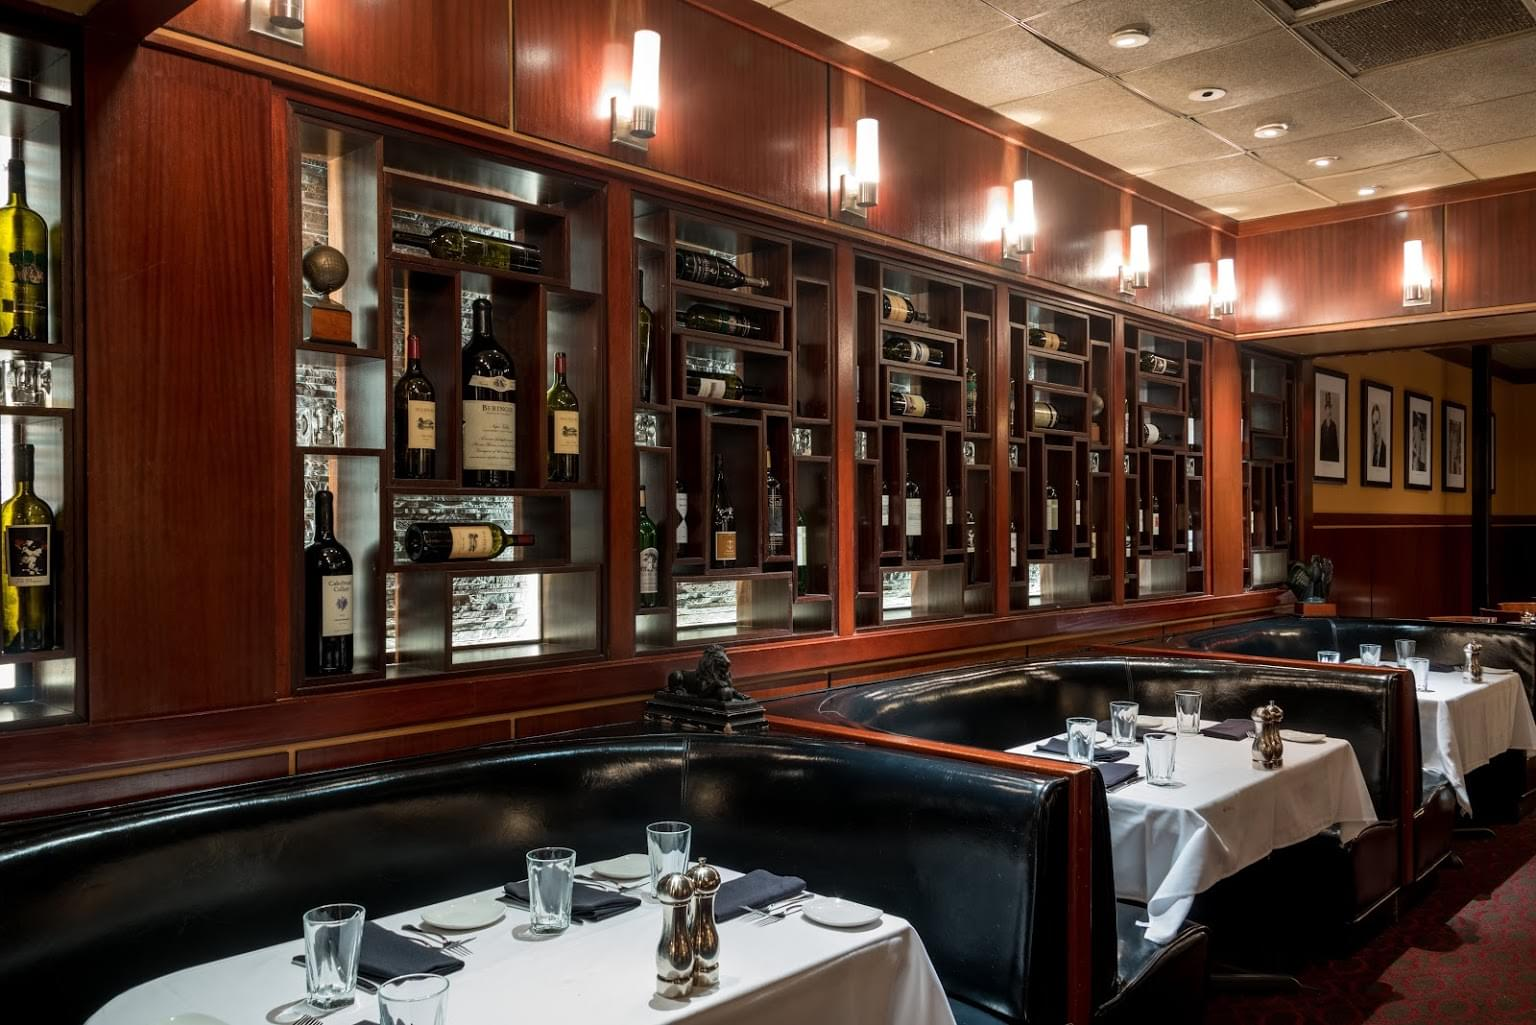 Sullivan's Steakhouse restaurant in Baton Rouge, LA